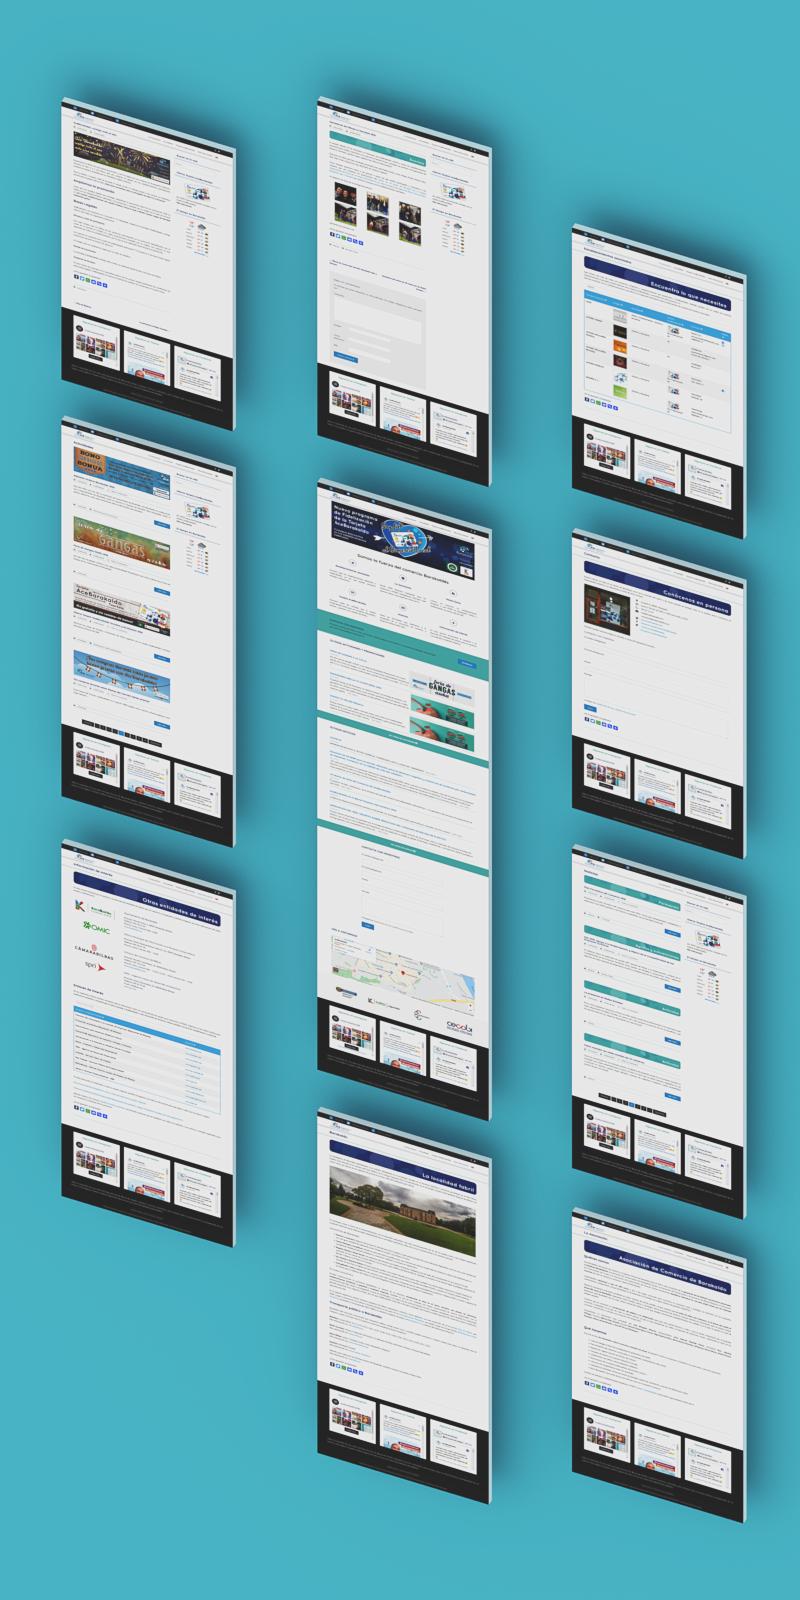 desarrollo web Diseño web Mockup Responsive wordpress